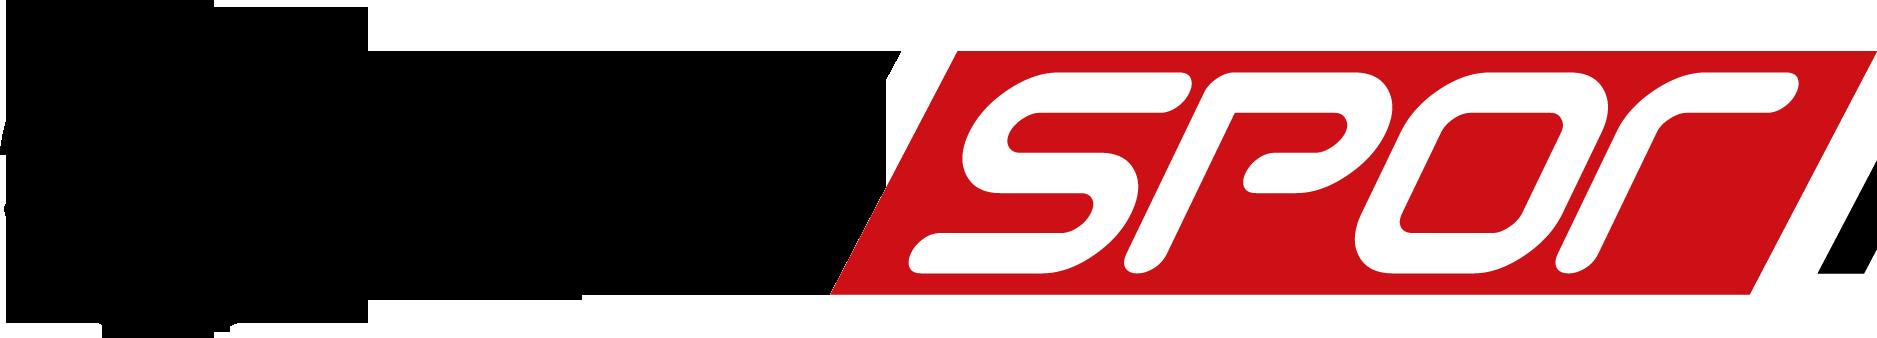 20130504105019%21NTV_Spor_logosu.png